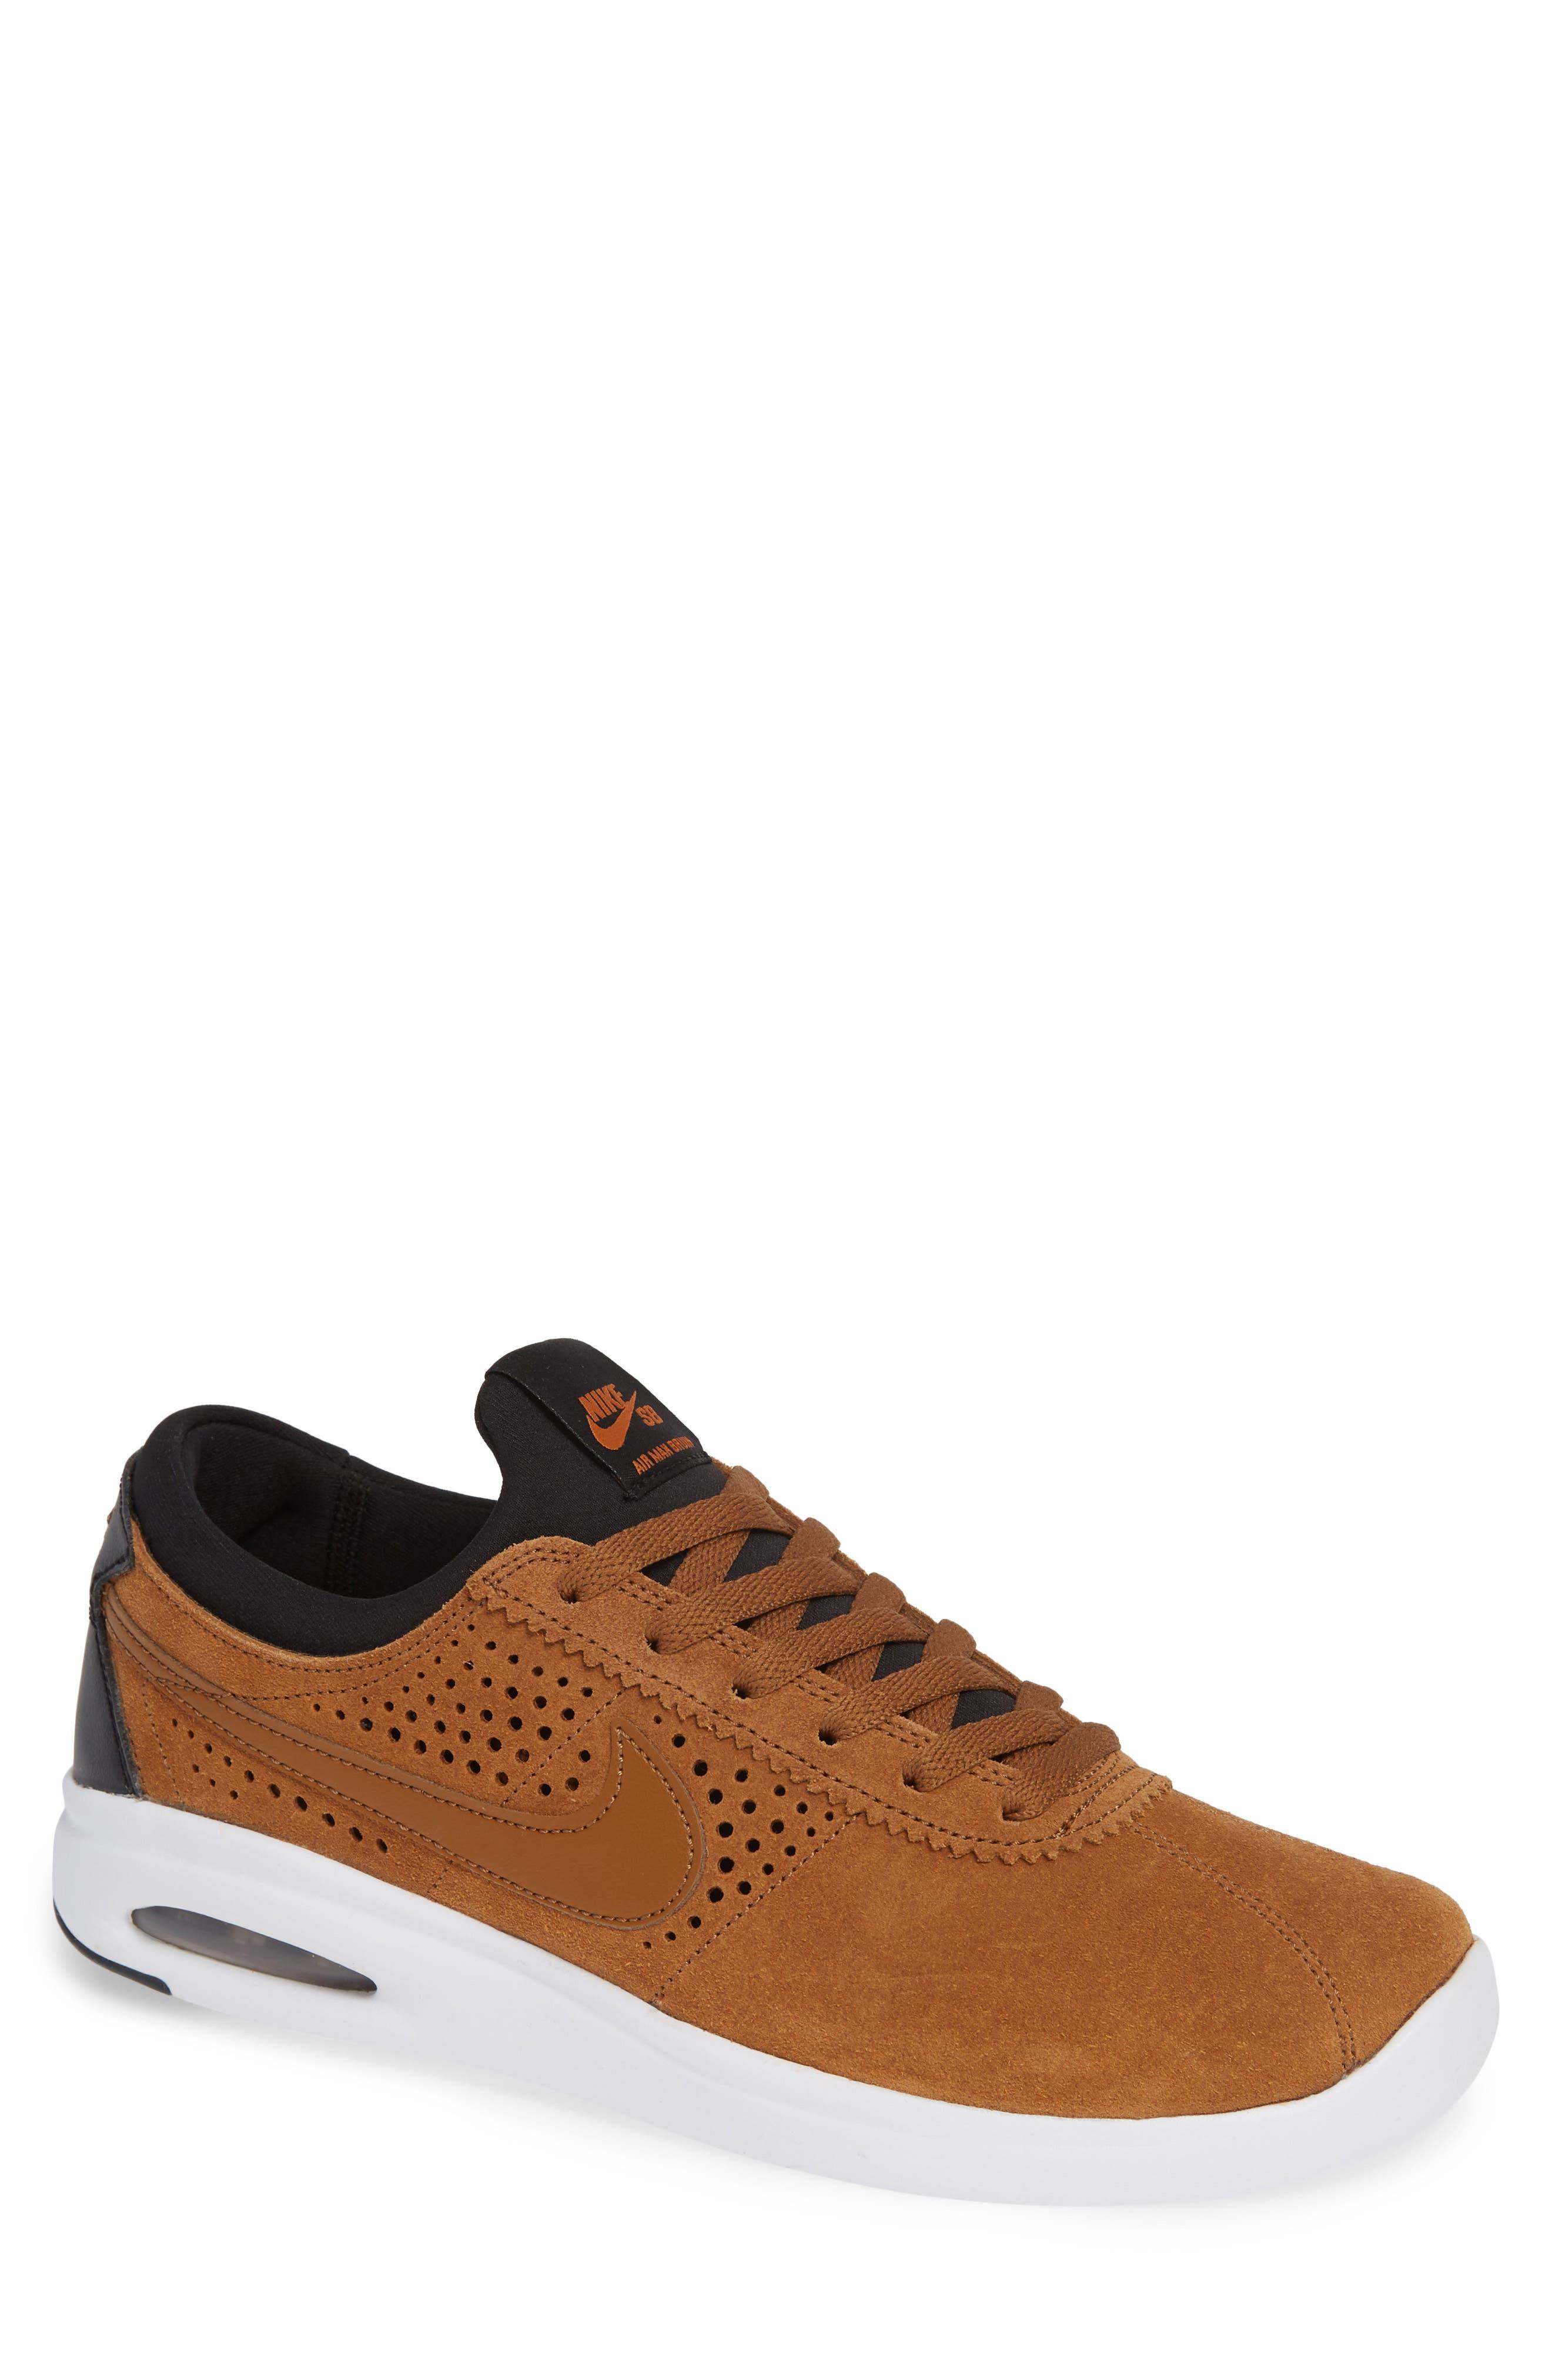 SB Air Max Bruin Vapor Skateboarding Sneaker,                             Main thumbnail 1, color,                             BRITISH TAN/ BLACK/ MONARCH